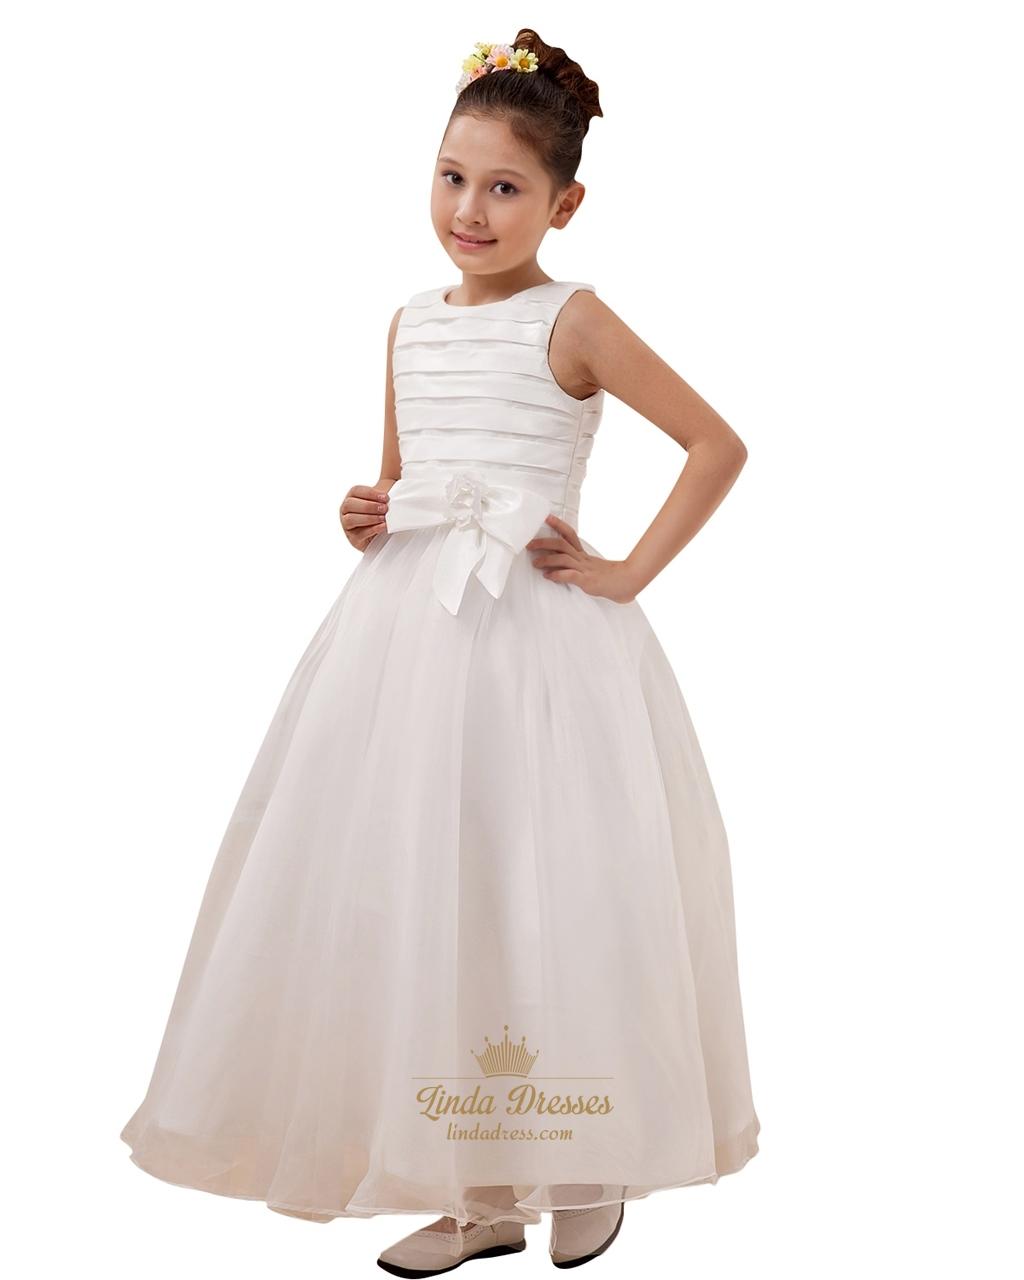 e1a80c878e1 Elegant White A-Line Scoop Organza Flower Girl Dress With Bow SKU -W098